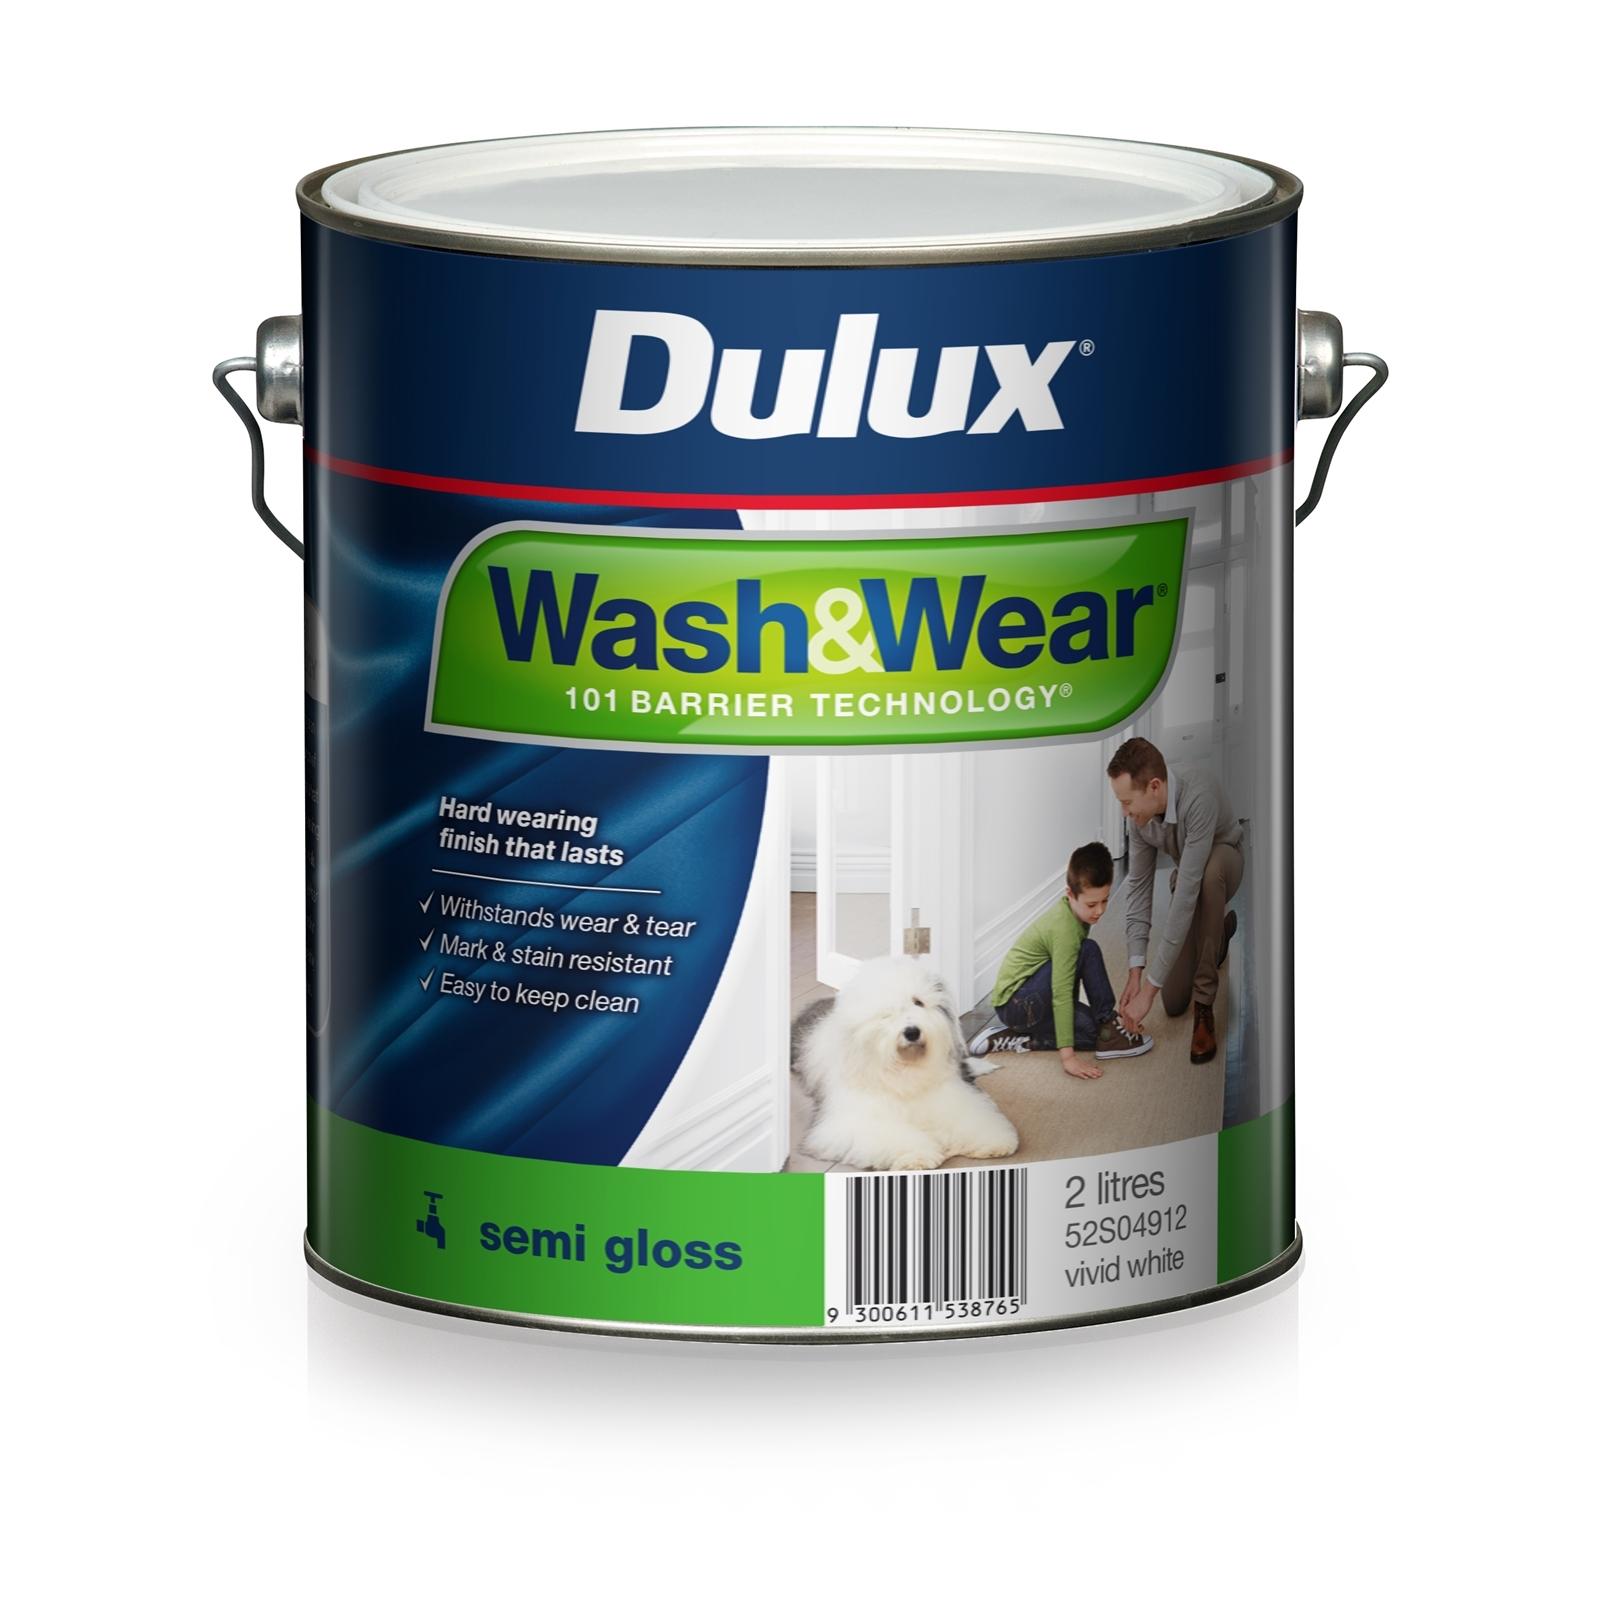 Dulux Wash & Wear 2L Vivid White Semi Gloss Interior Paint